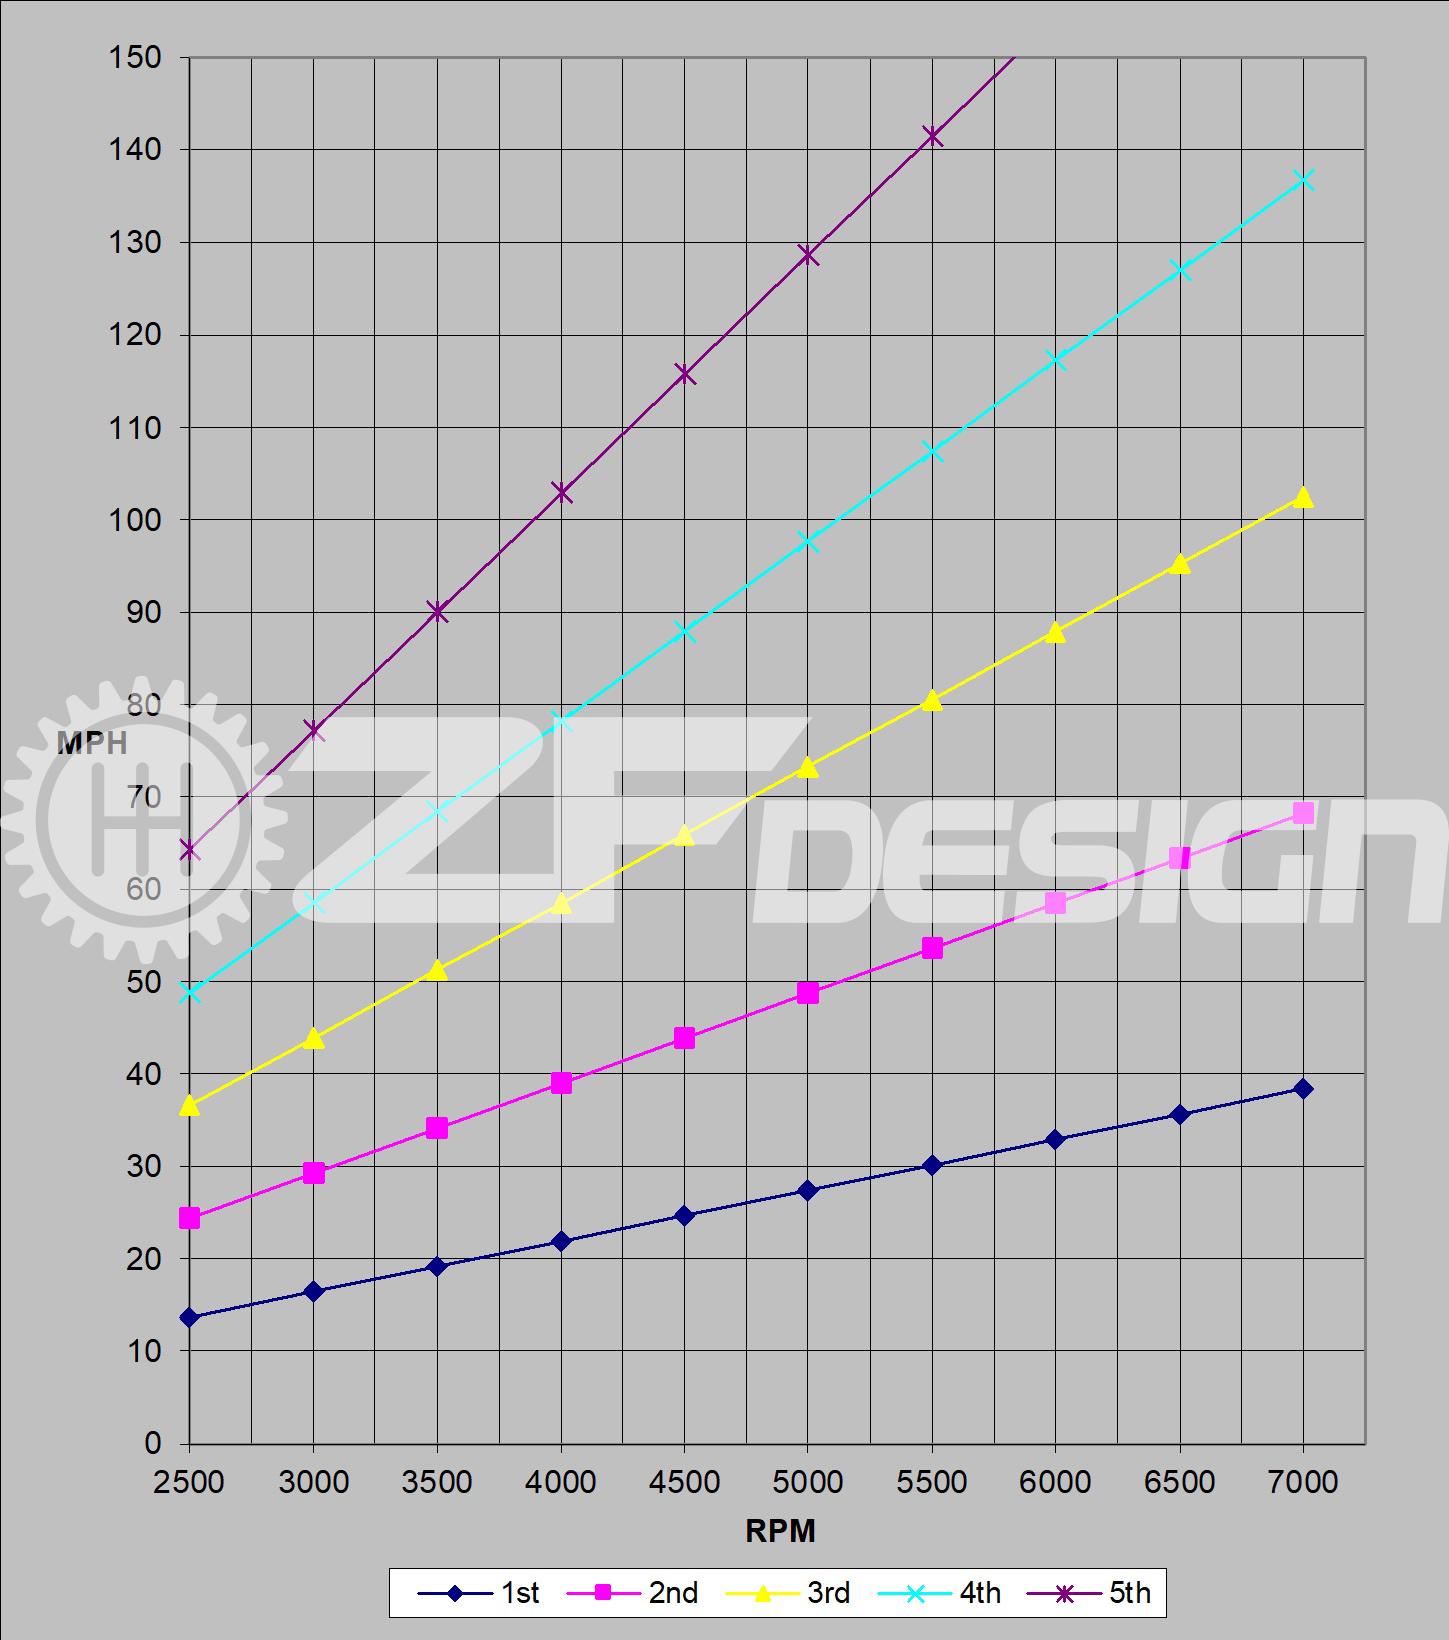 02-05 WRX Graph 08+ or LGT 3-4